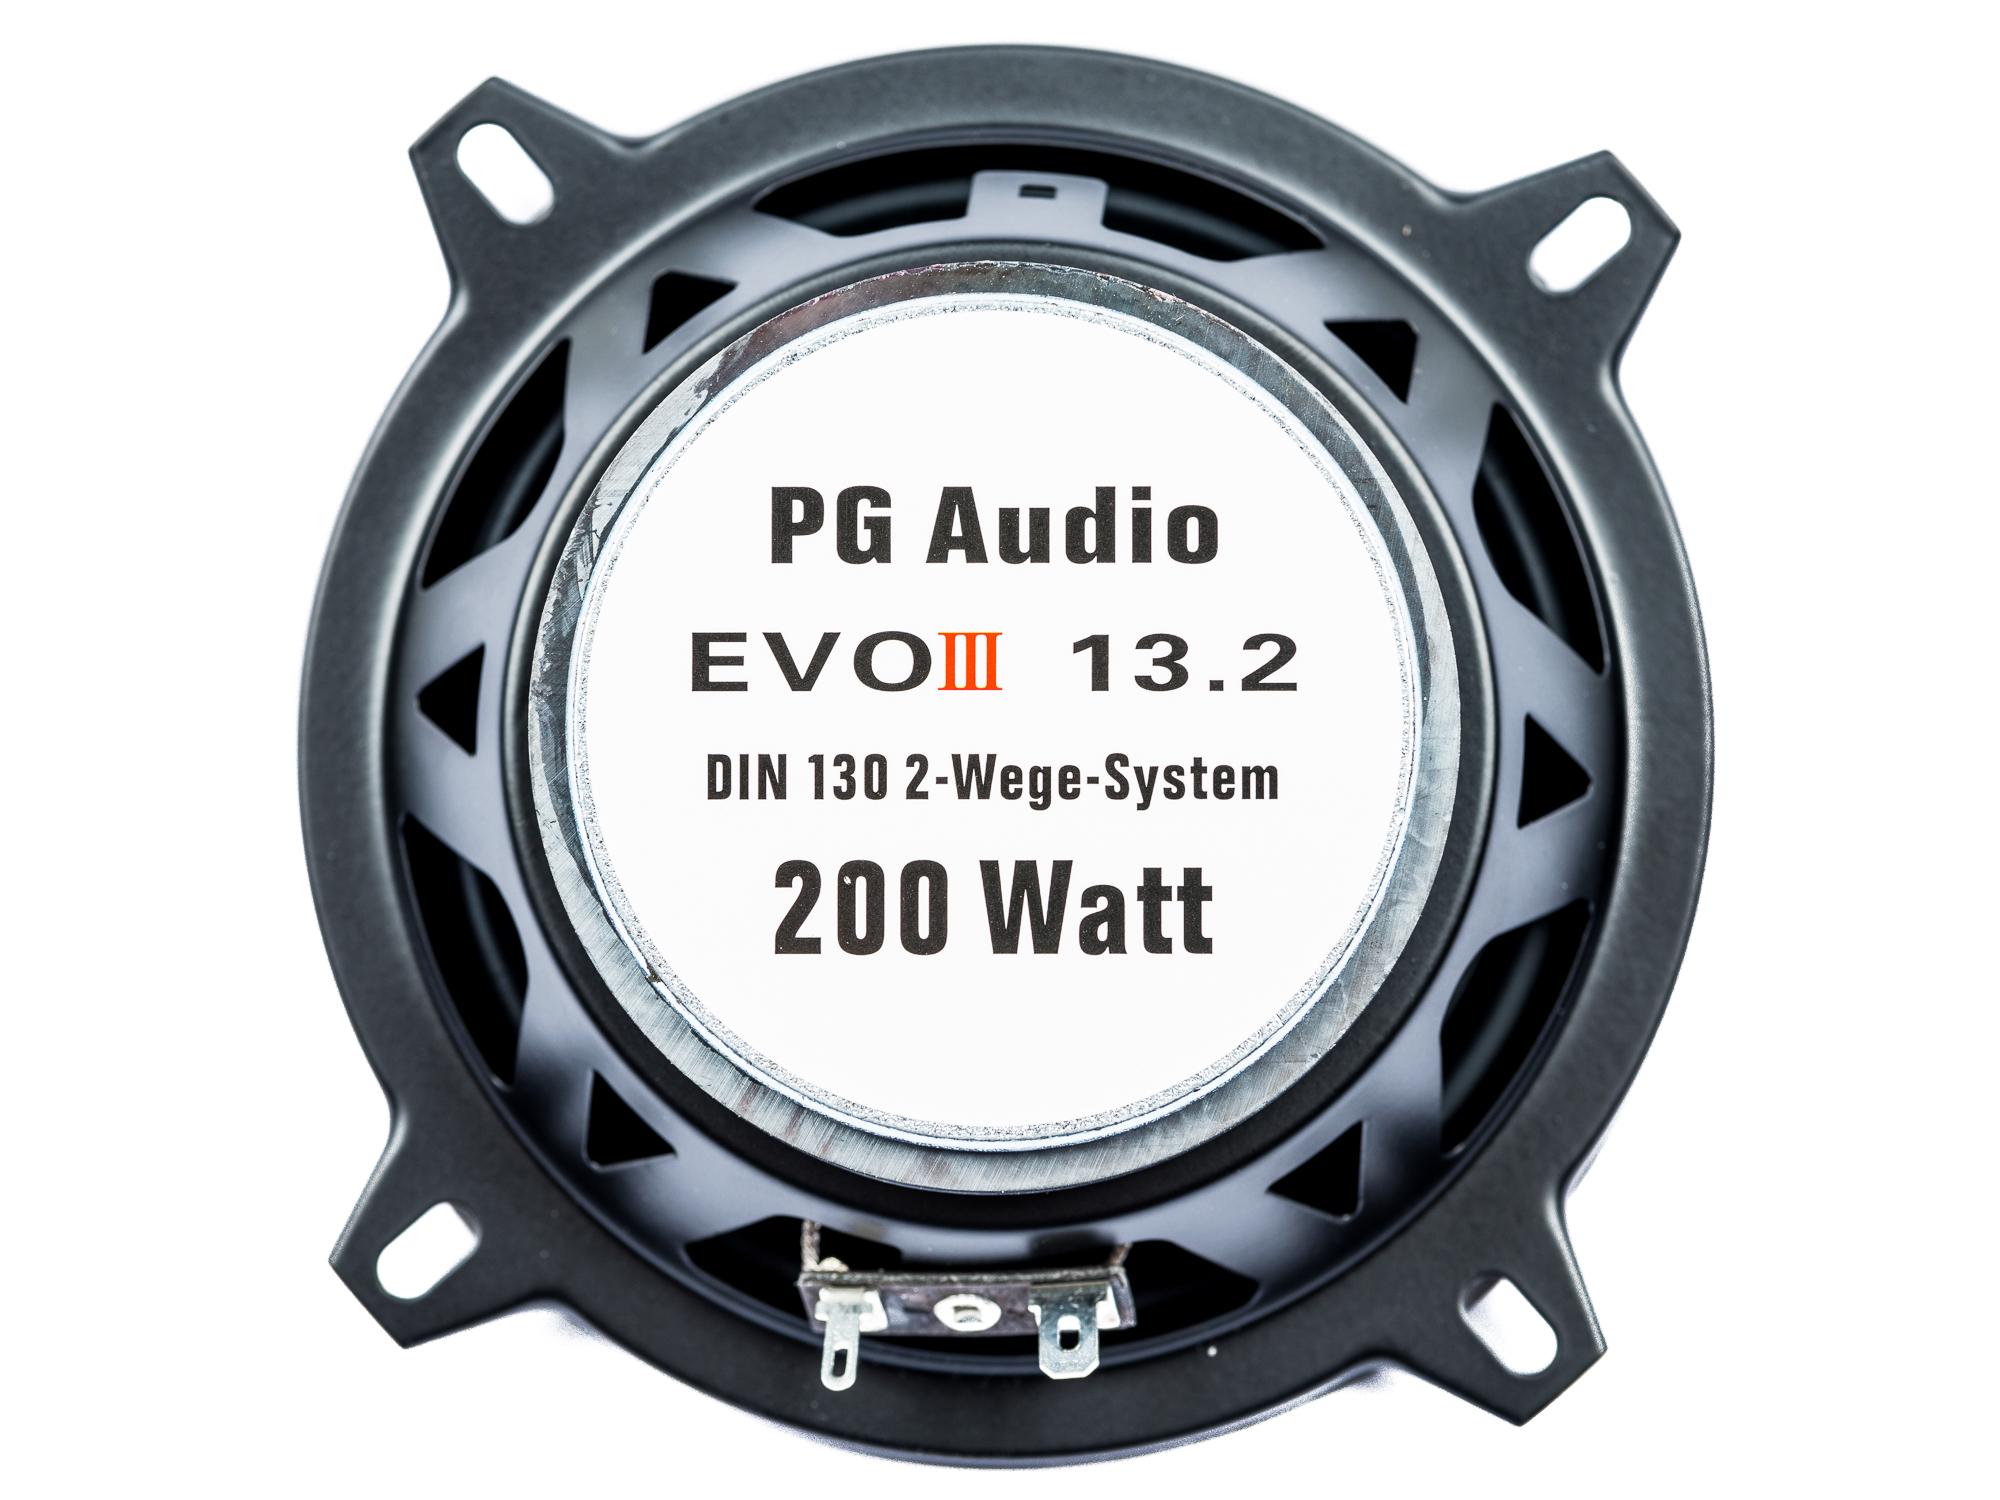 PG Audio EVO III 13.2, 13 cm Coaxial Lautsprecher passend für Chrysler,Citroen,Dacia,Ford,Opel,Peugeot & Renault – Bild 2